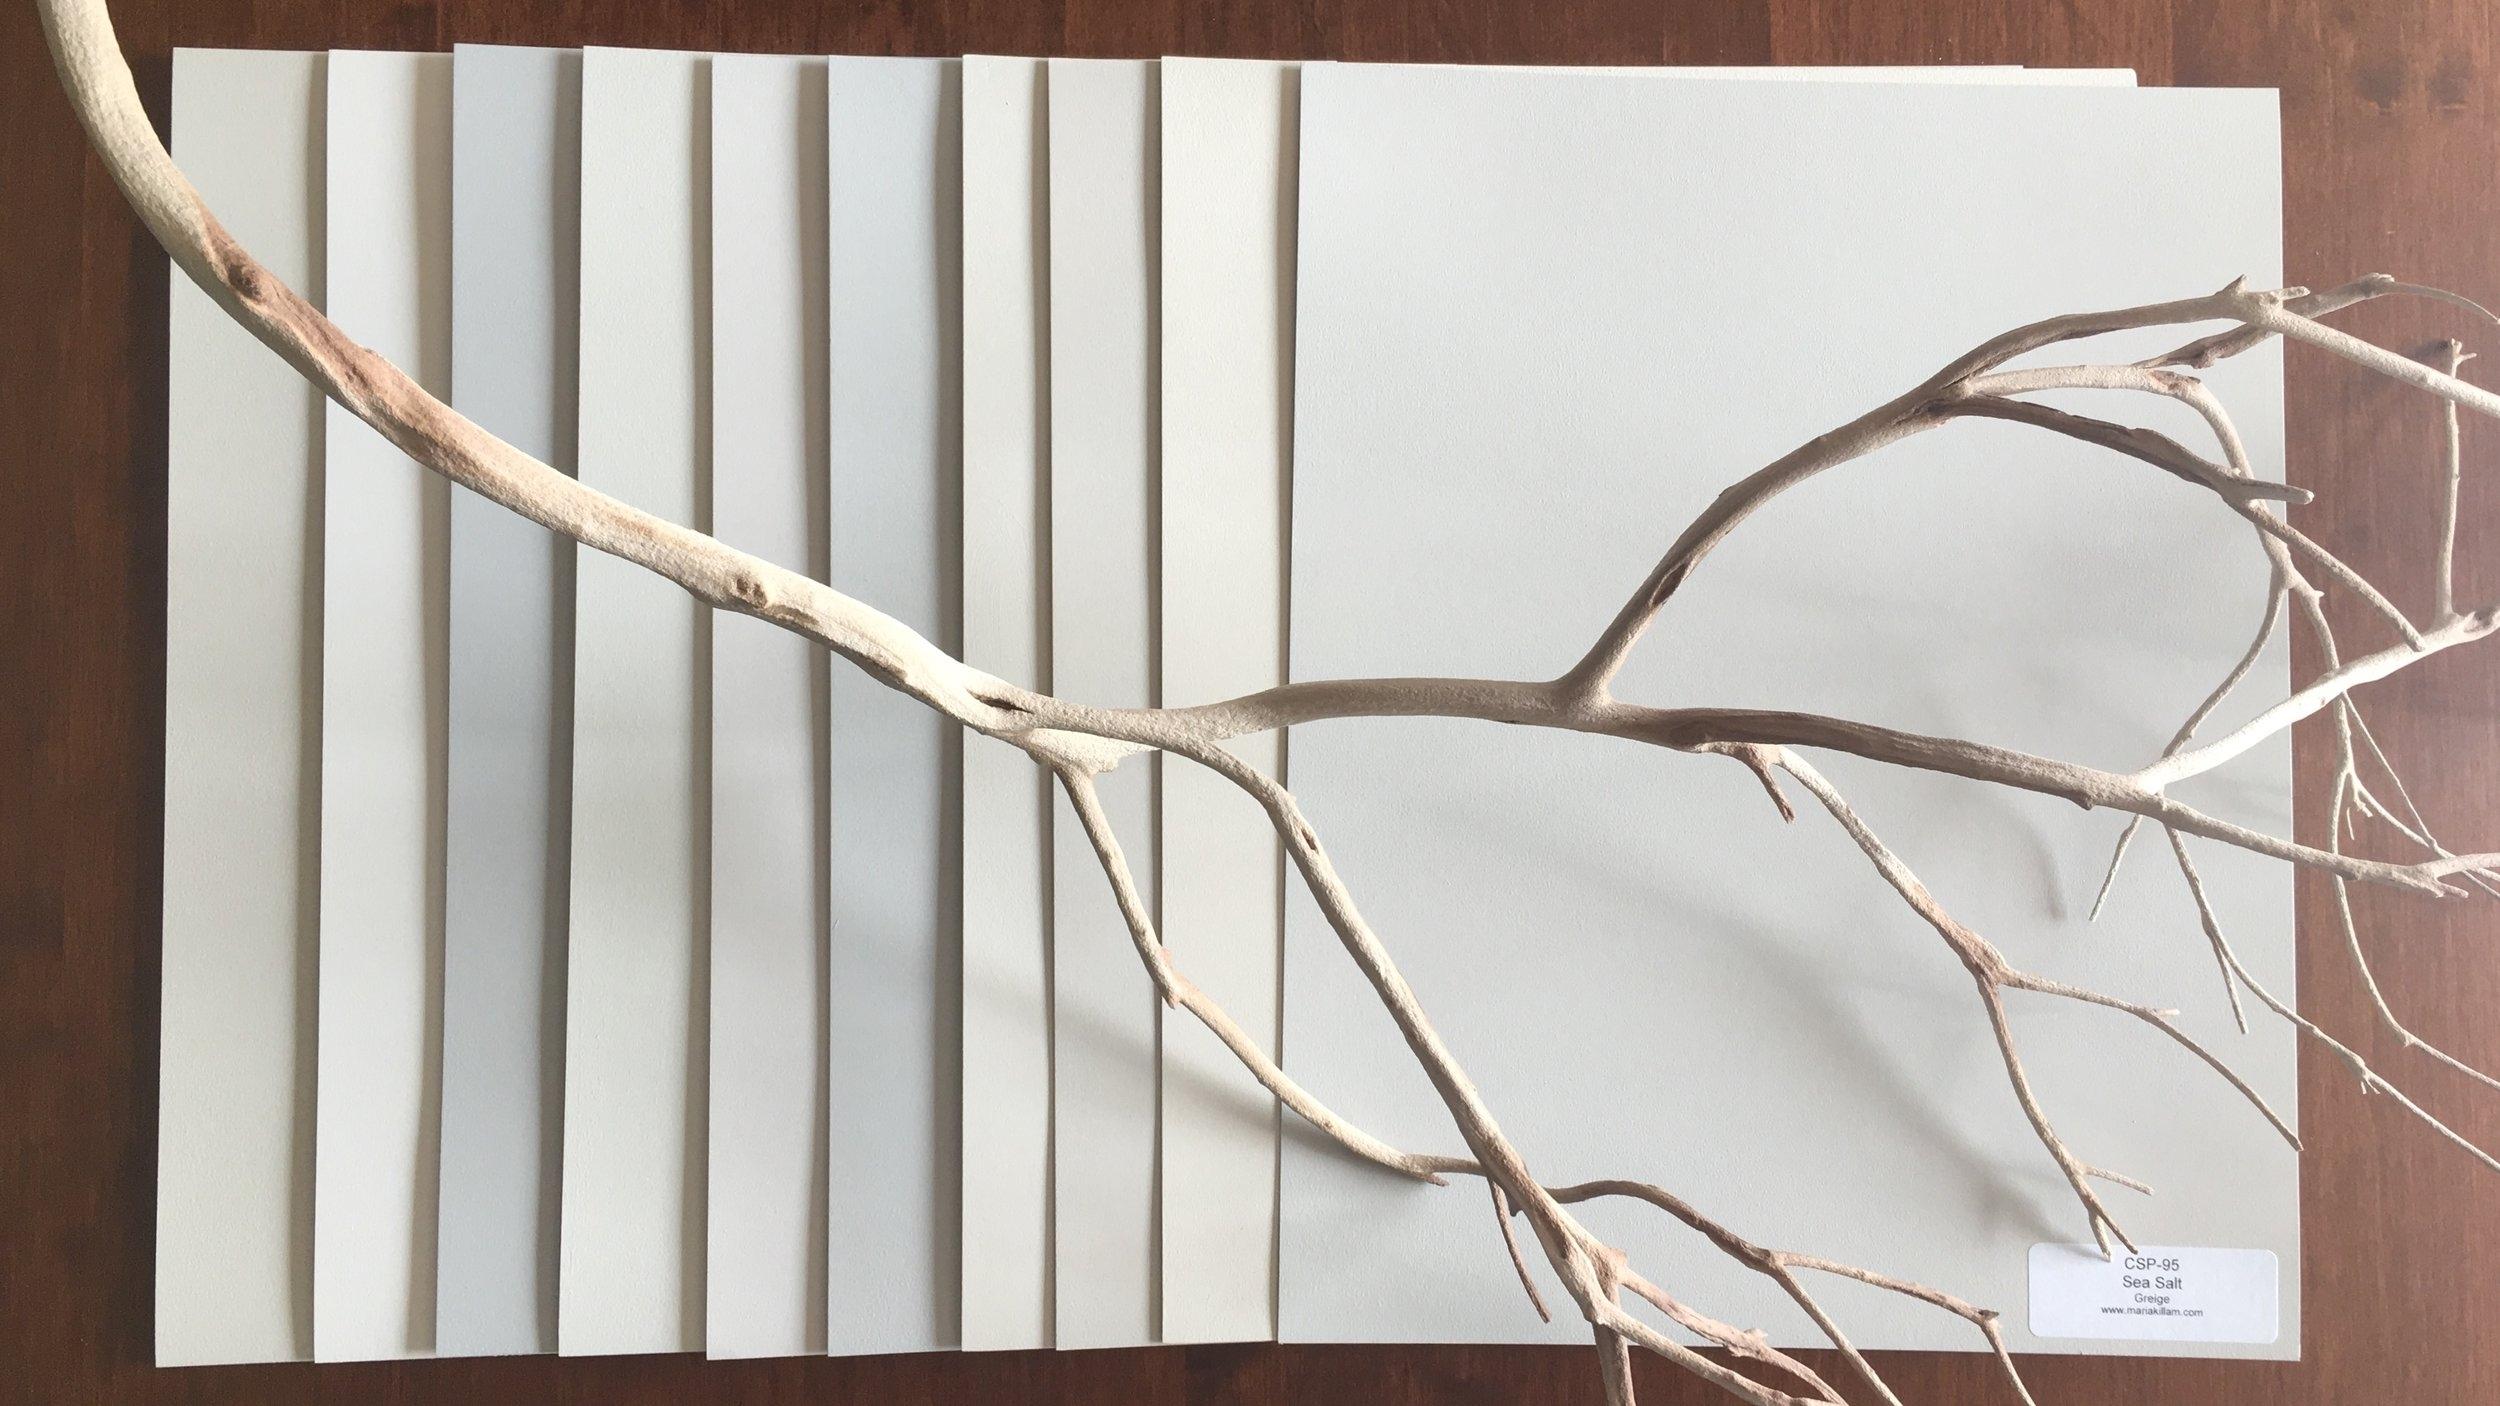 Large sample boards